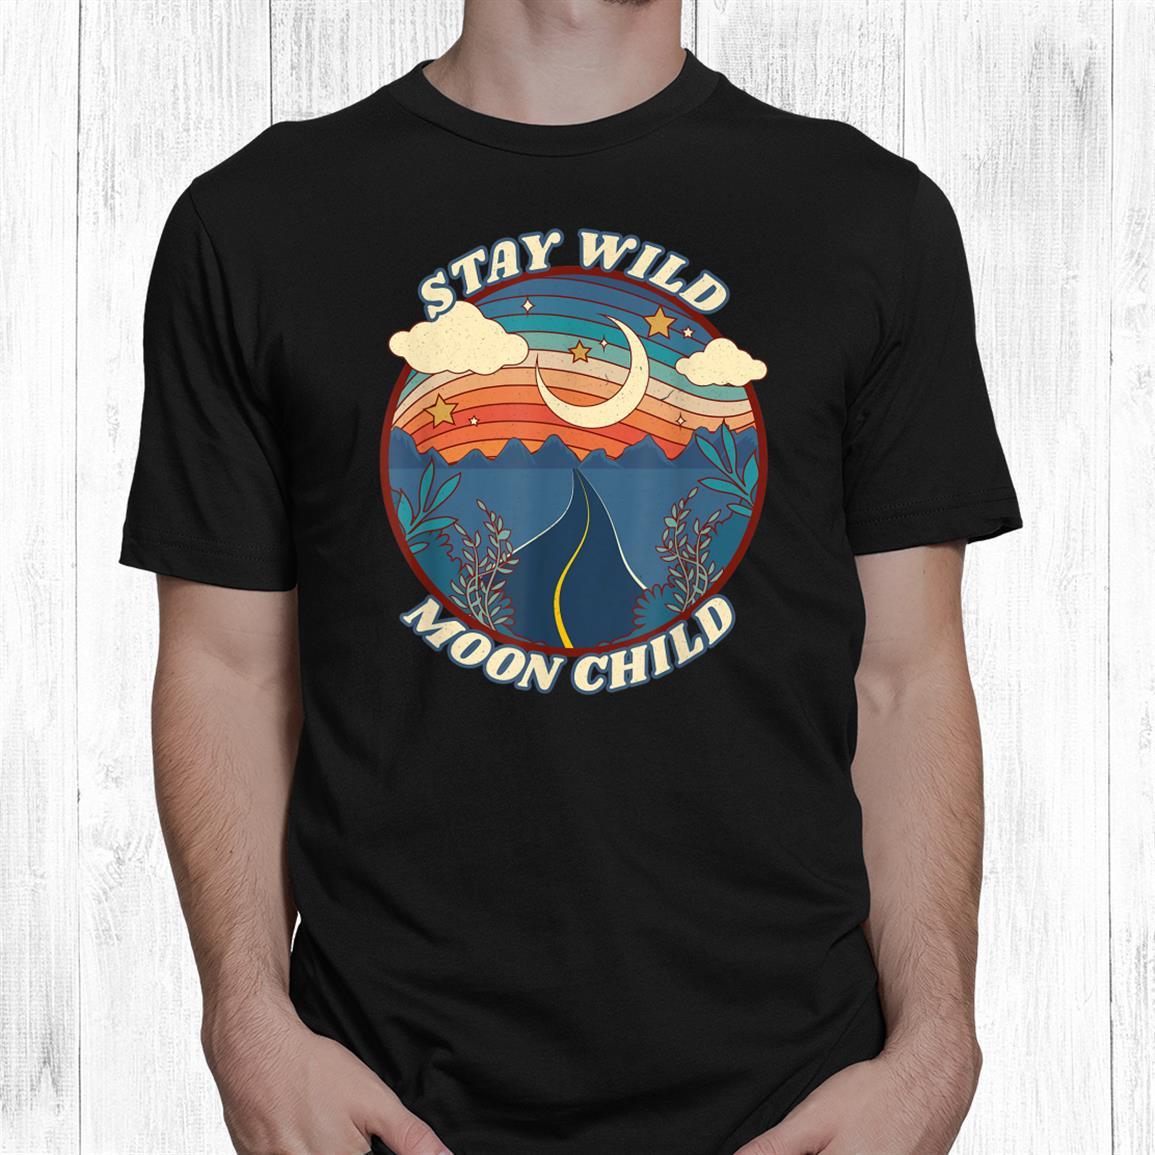 Vintage Retro Stay Wild Moon Child Boho Peace Hippie Shirt